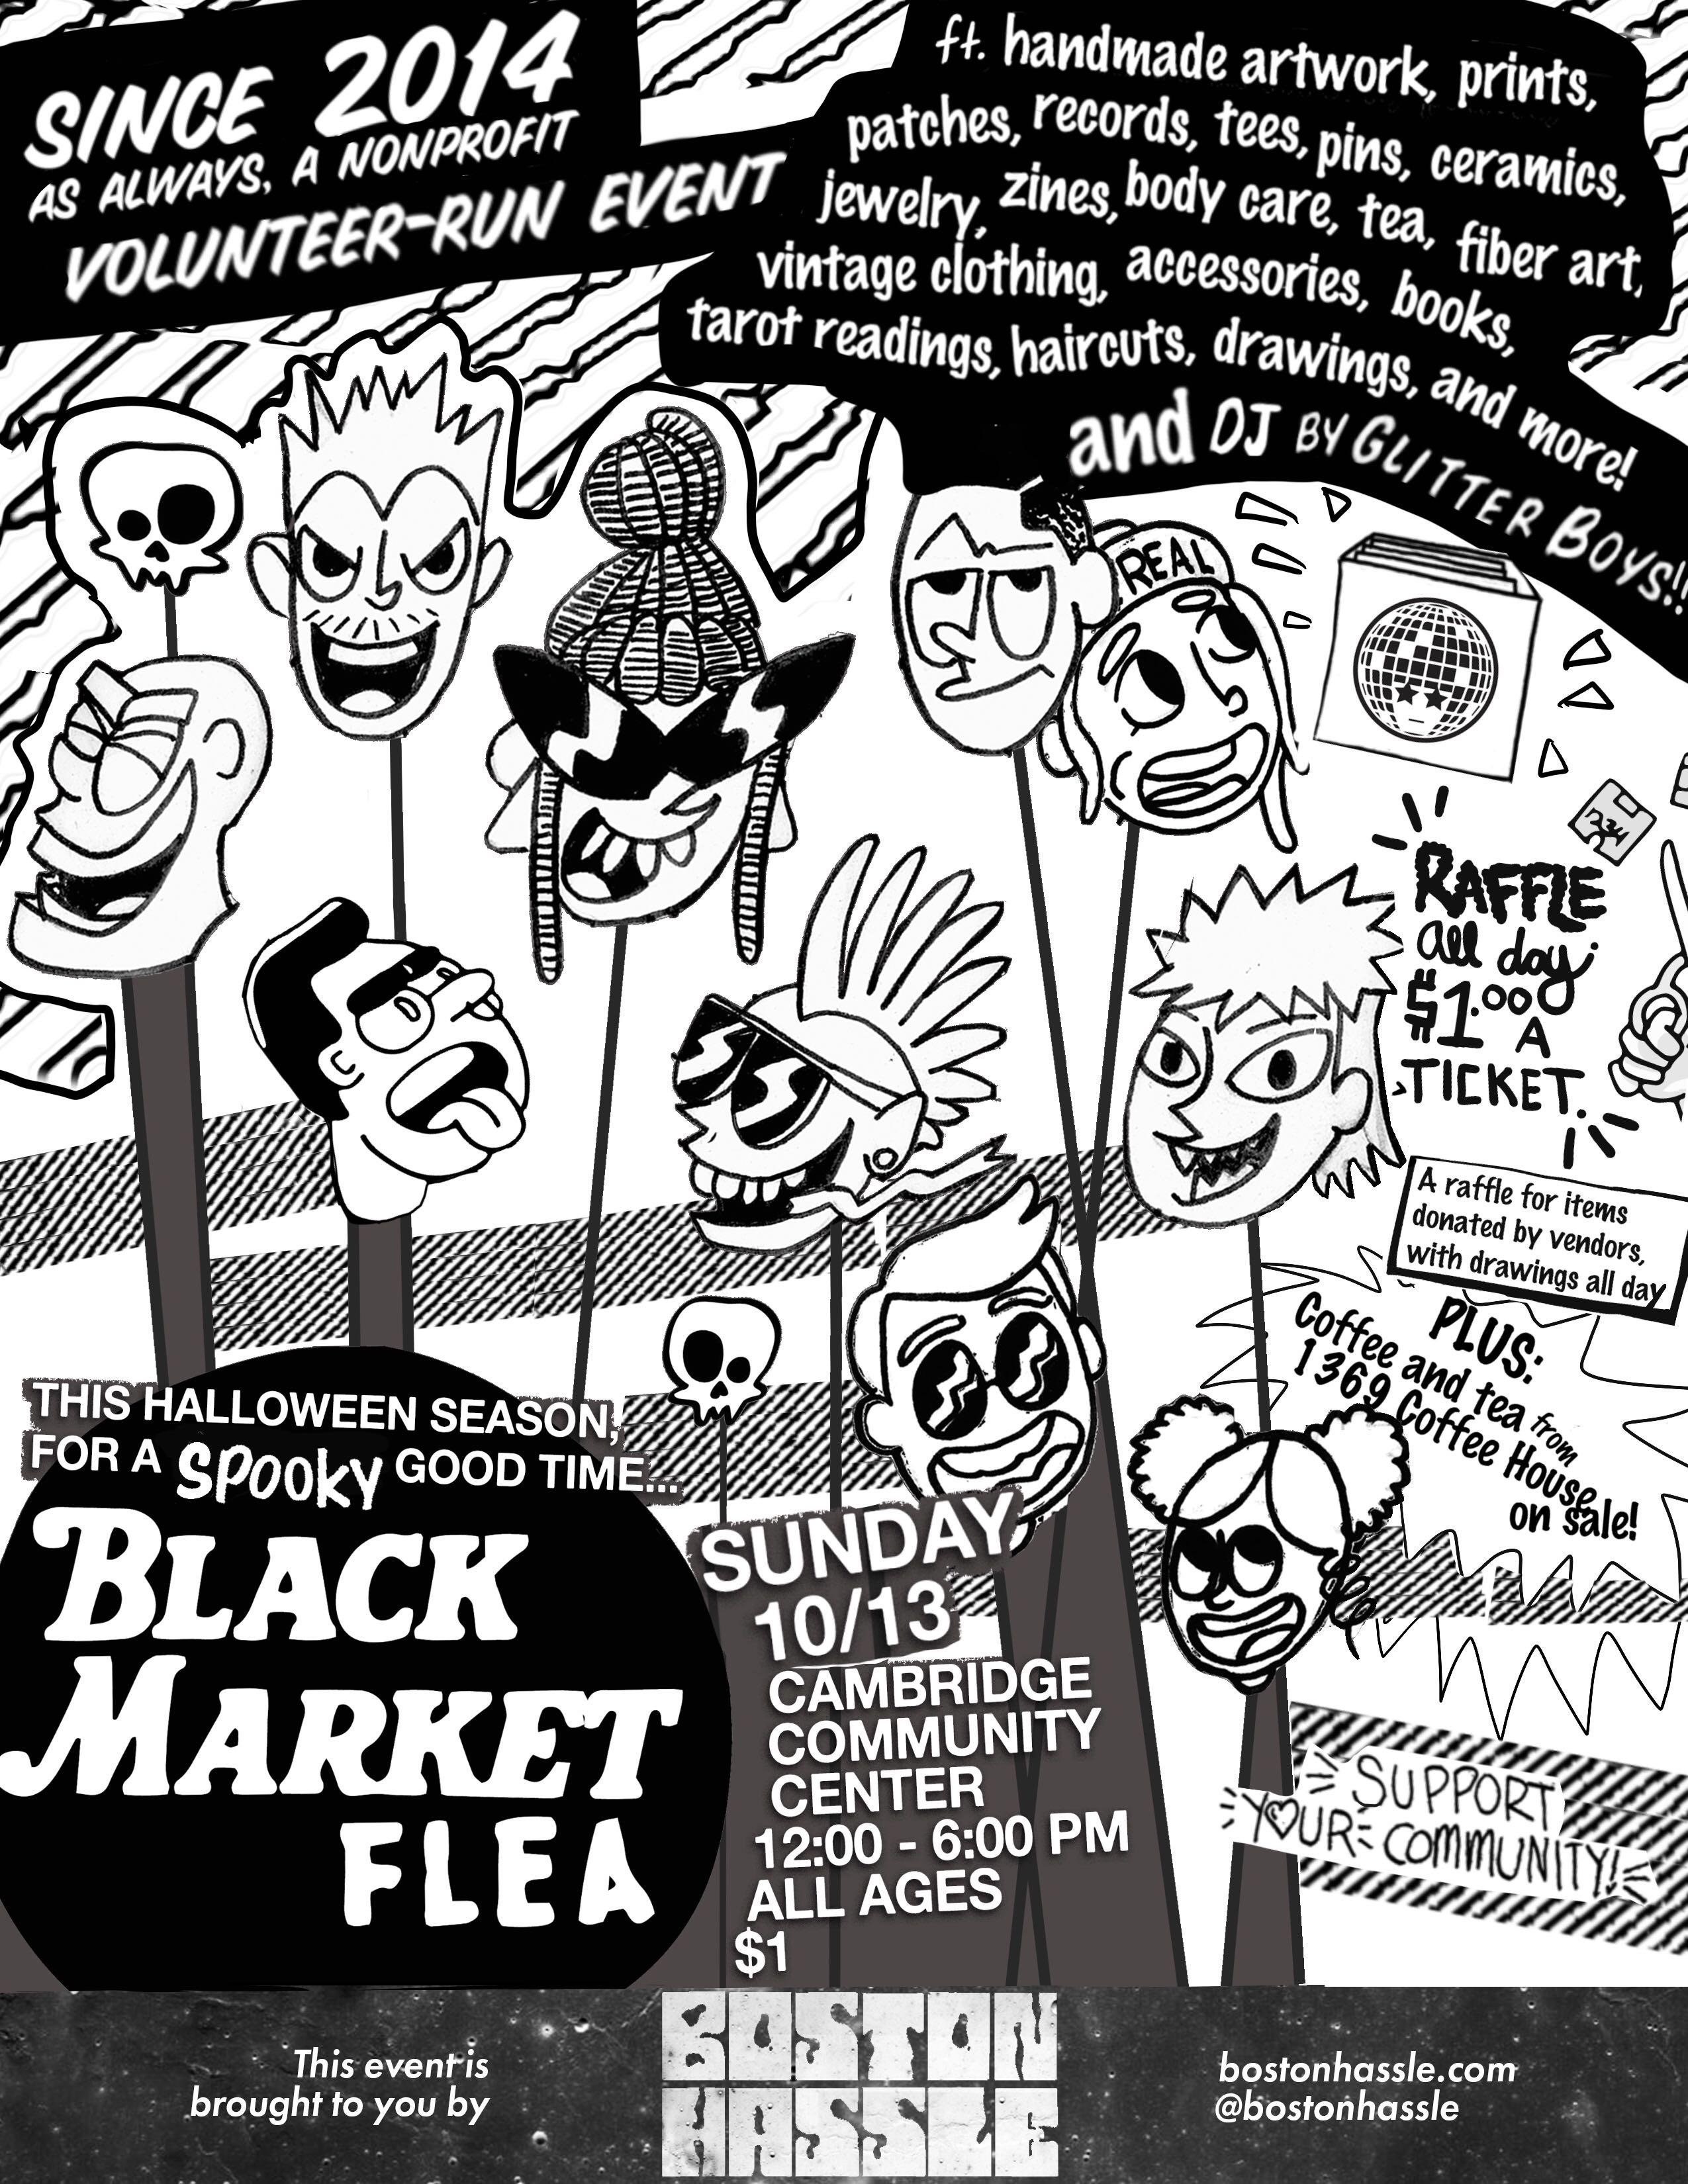 Boston Hassle Presents Black Market Flea Boston Hassle